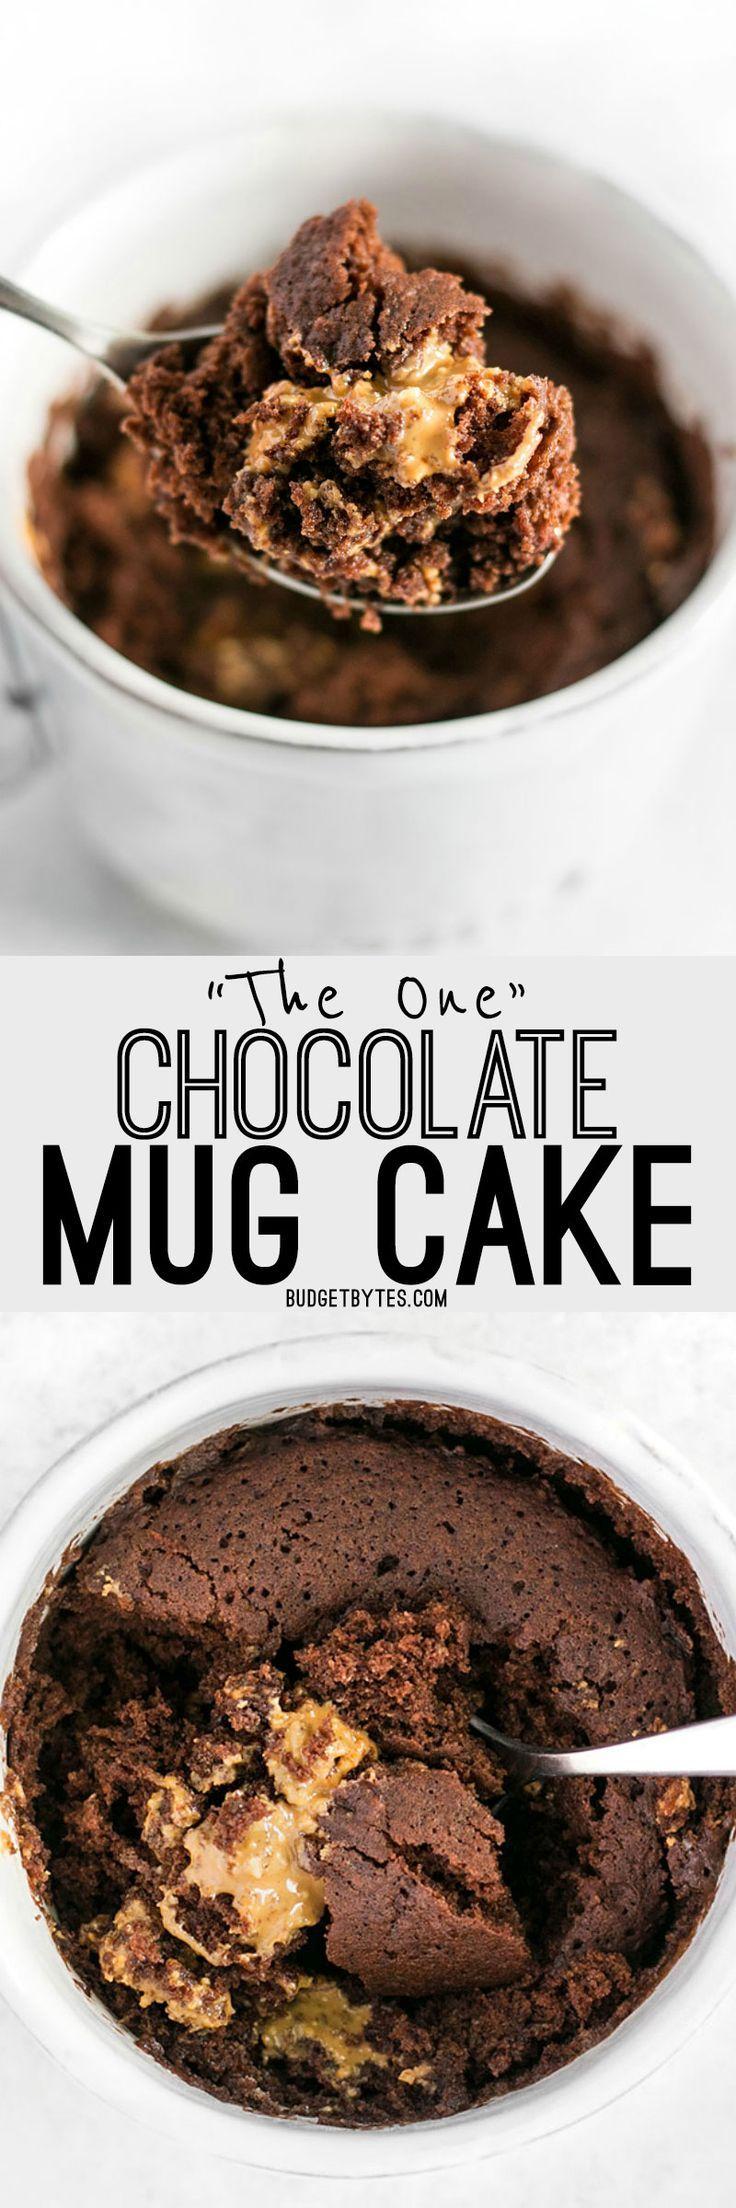 snabba mug cakes